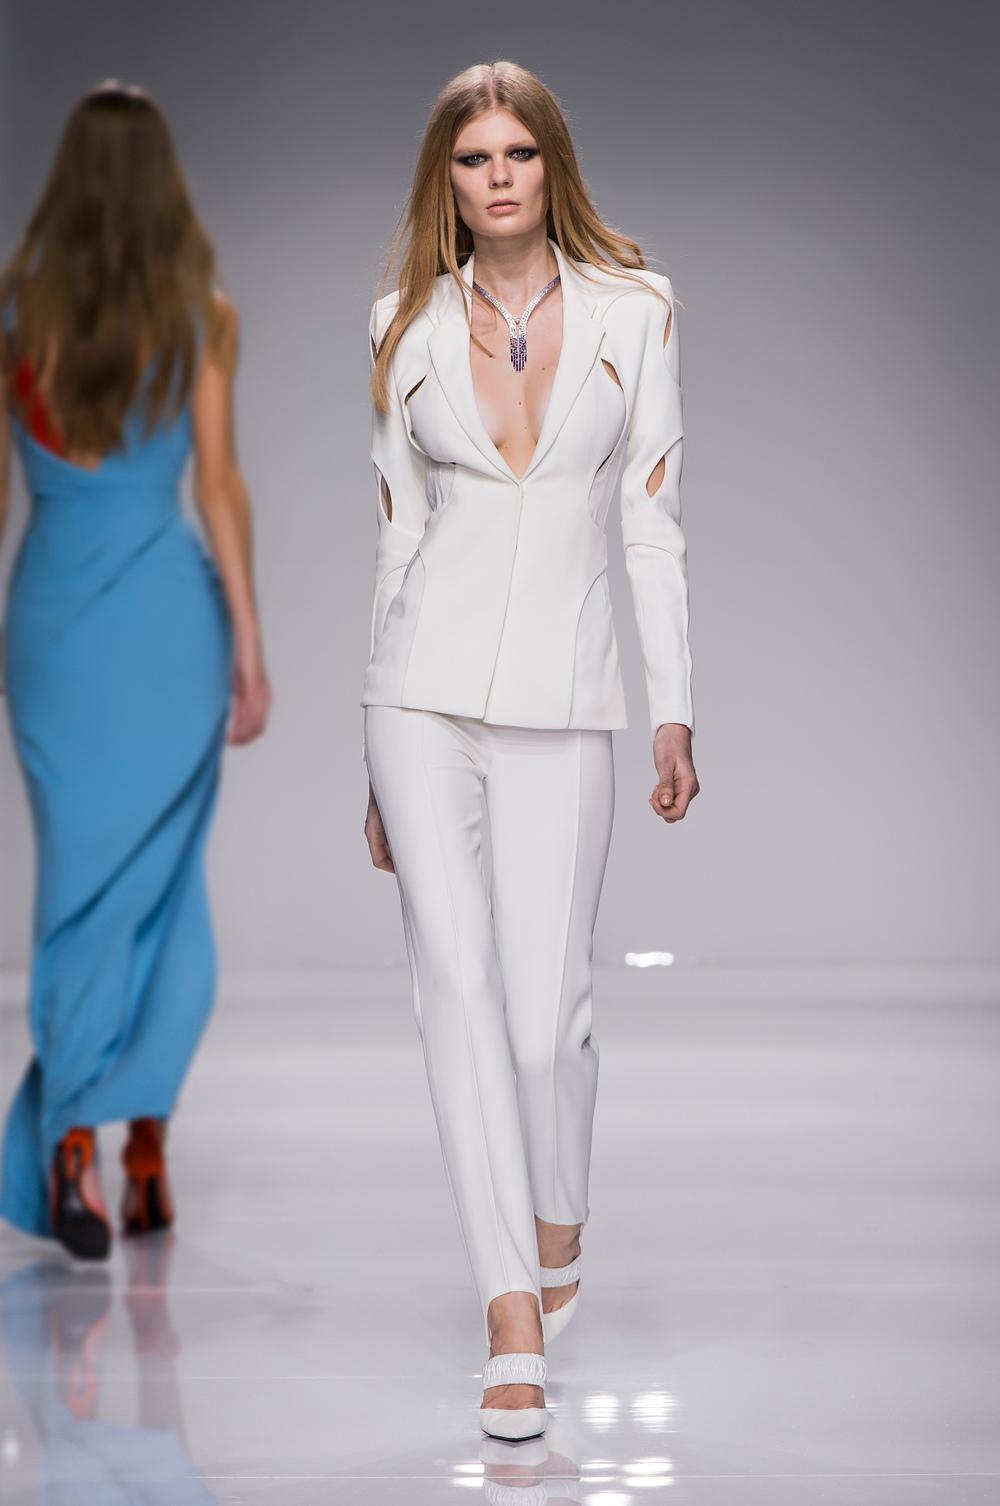 Atelier Versace SS16_Look 10.JPG